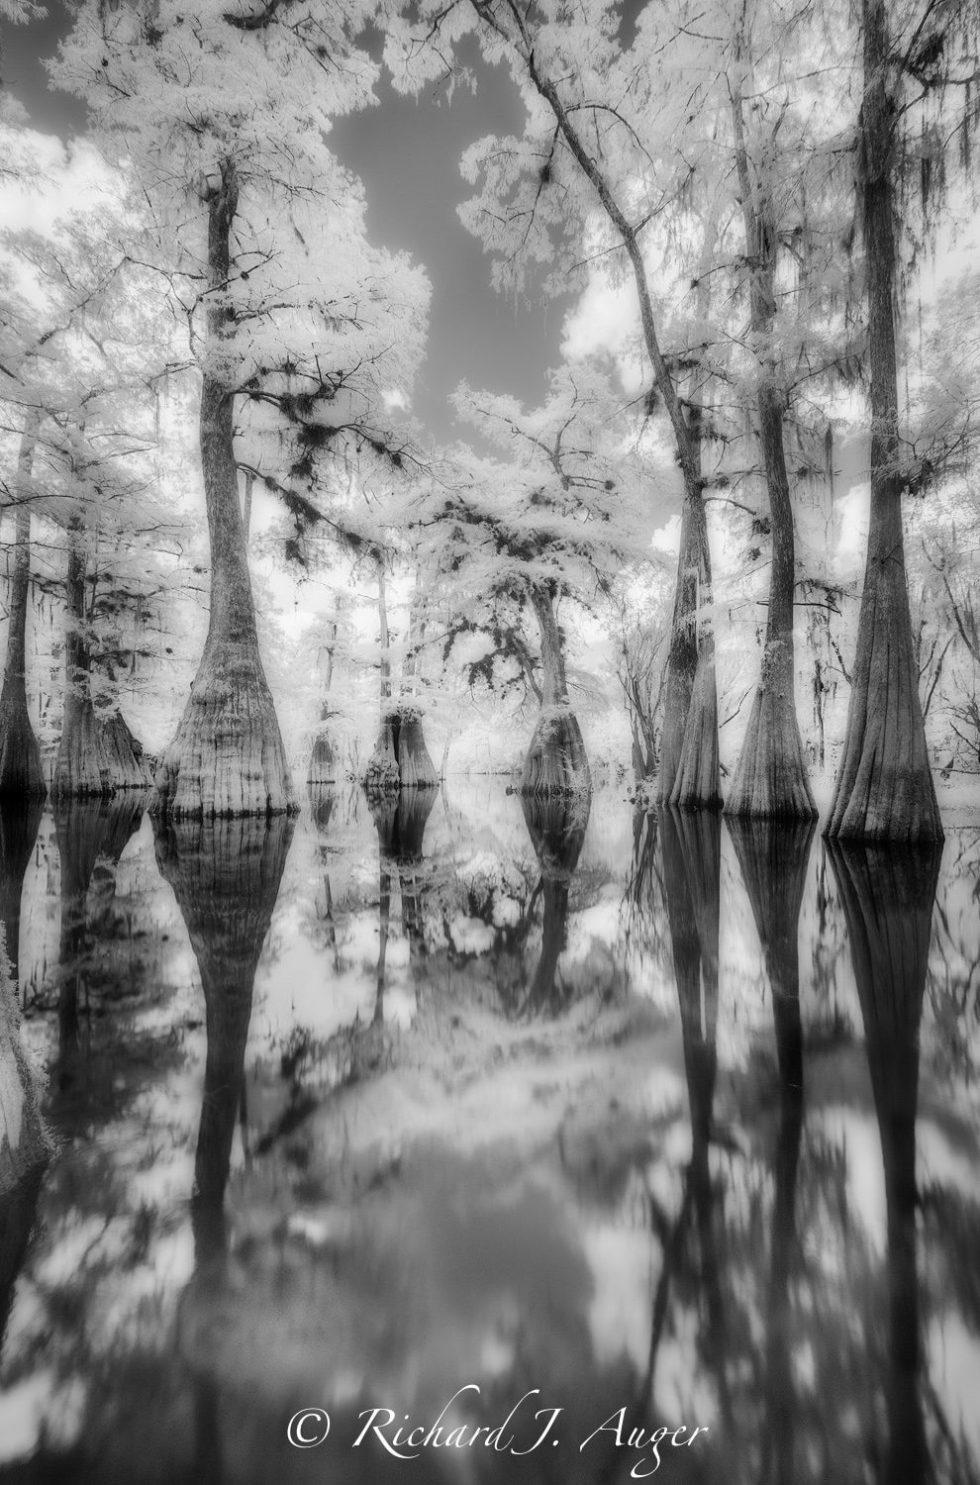 Suwannee River, Santa Fe River, Florida, Nature, Cypress, Black and White, Panhandle, Photo, Photographer